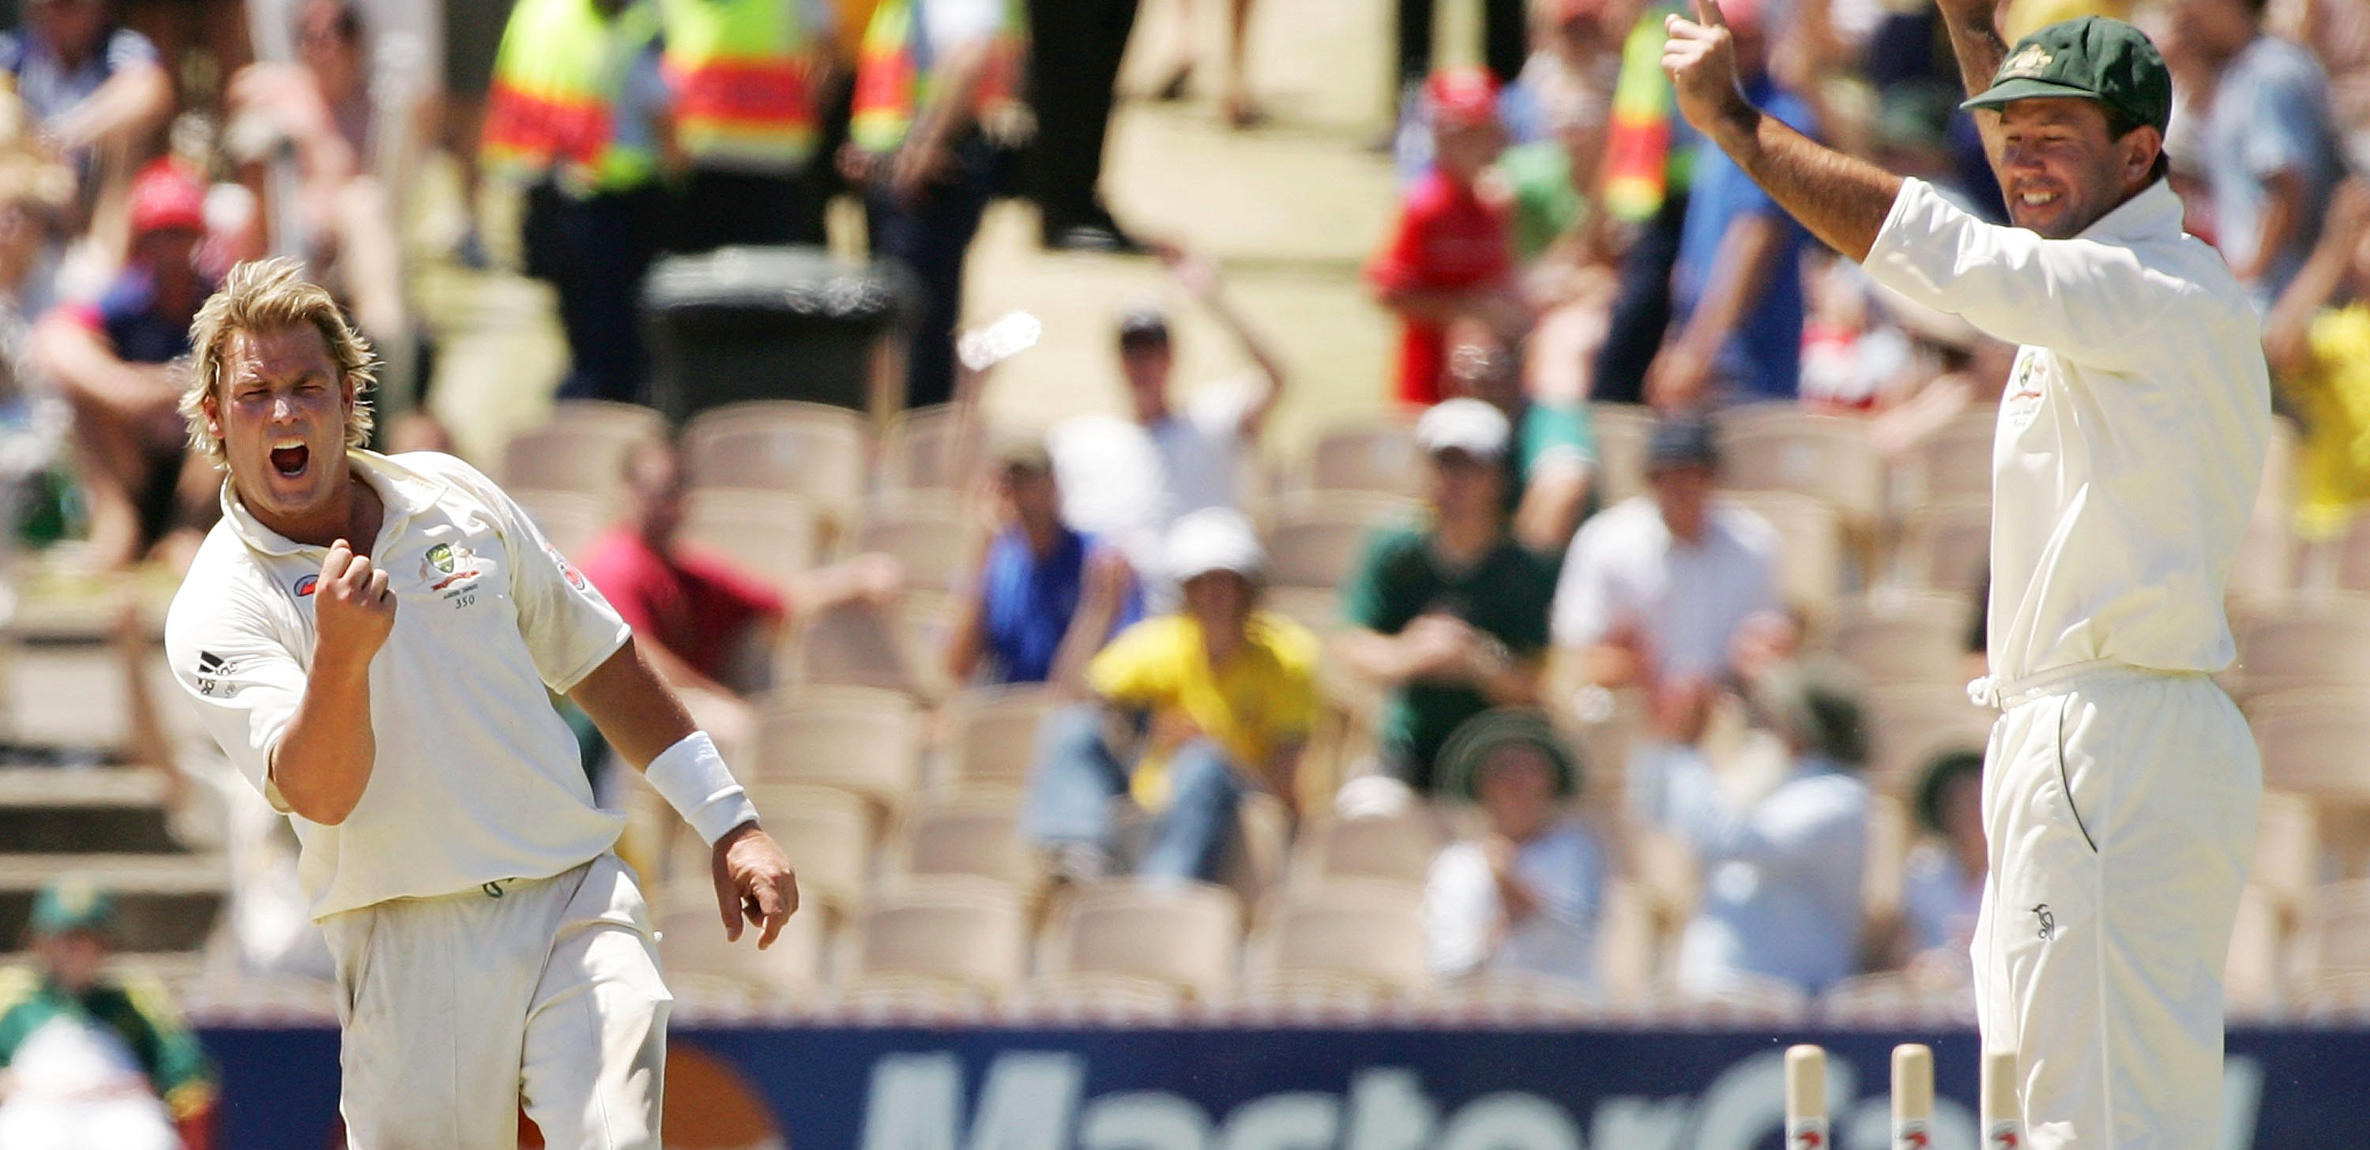 Shane Warne of Australia and team-mate Ricky Ponting celebrate